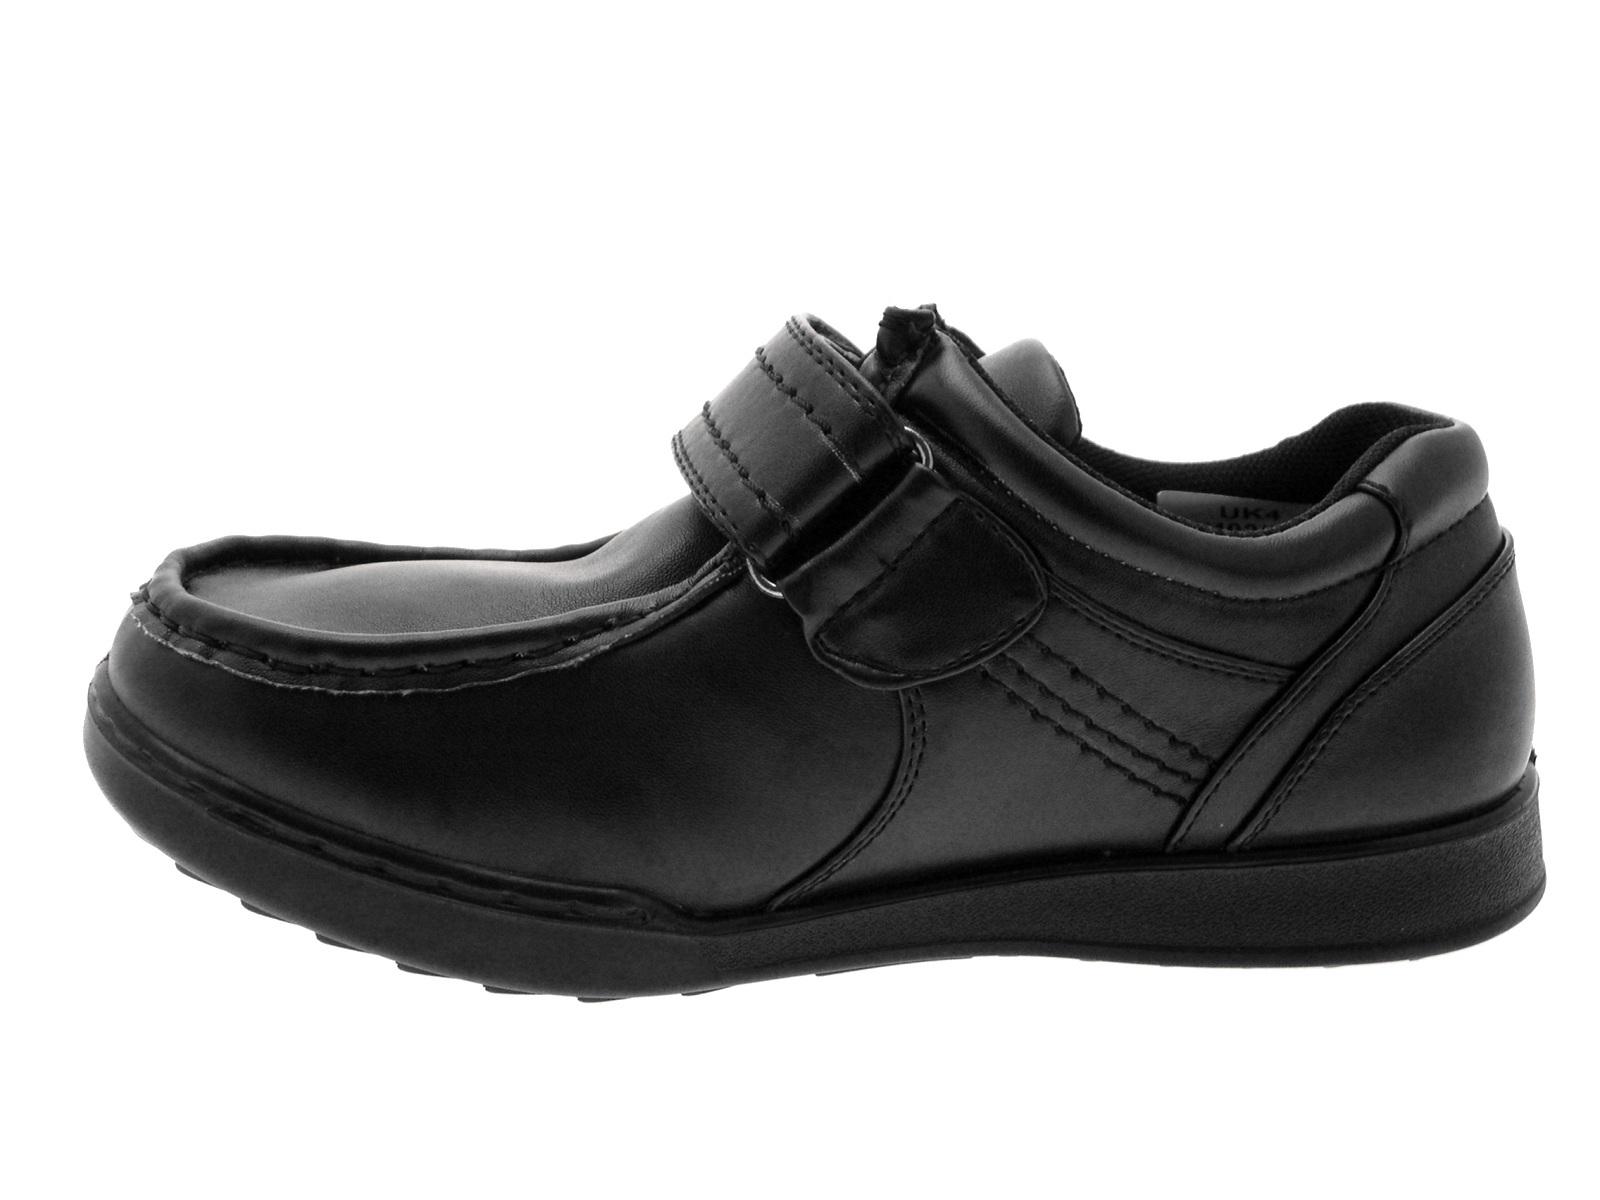 Boys Shoes Boys Formal Shoes Black Shoes Velcro Leather